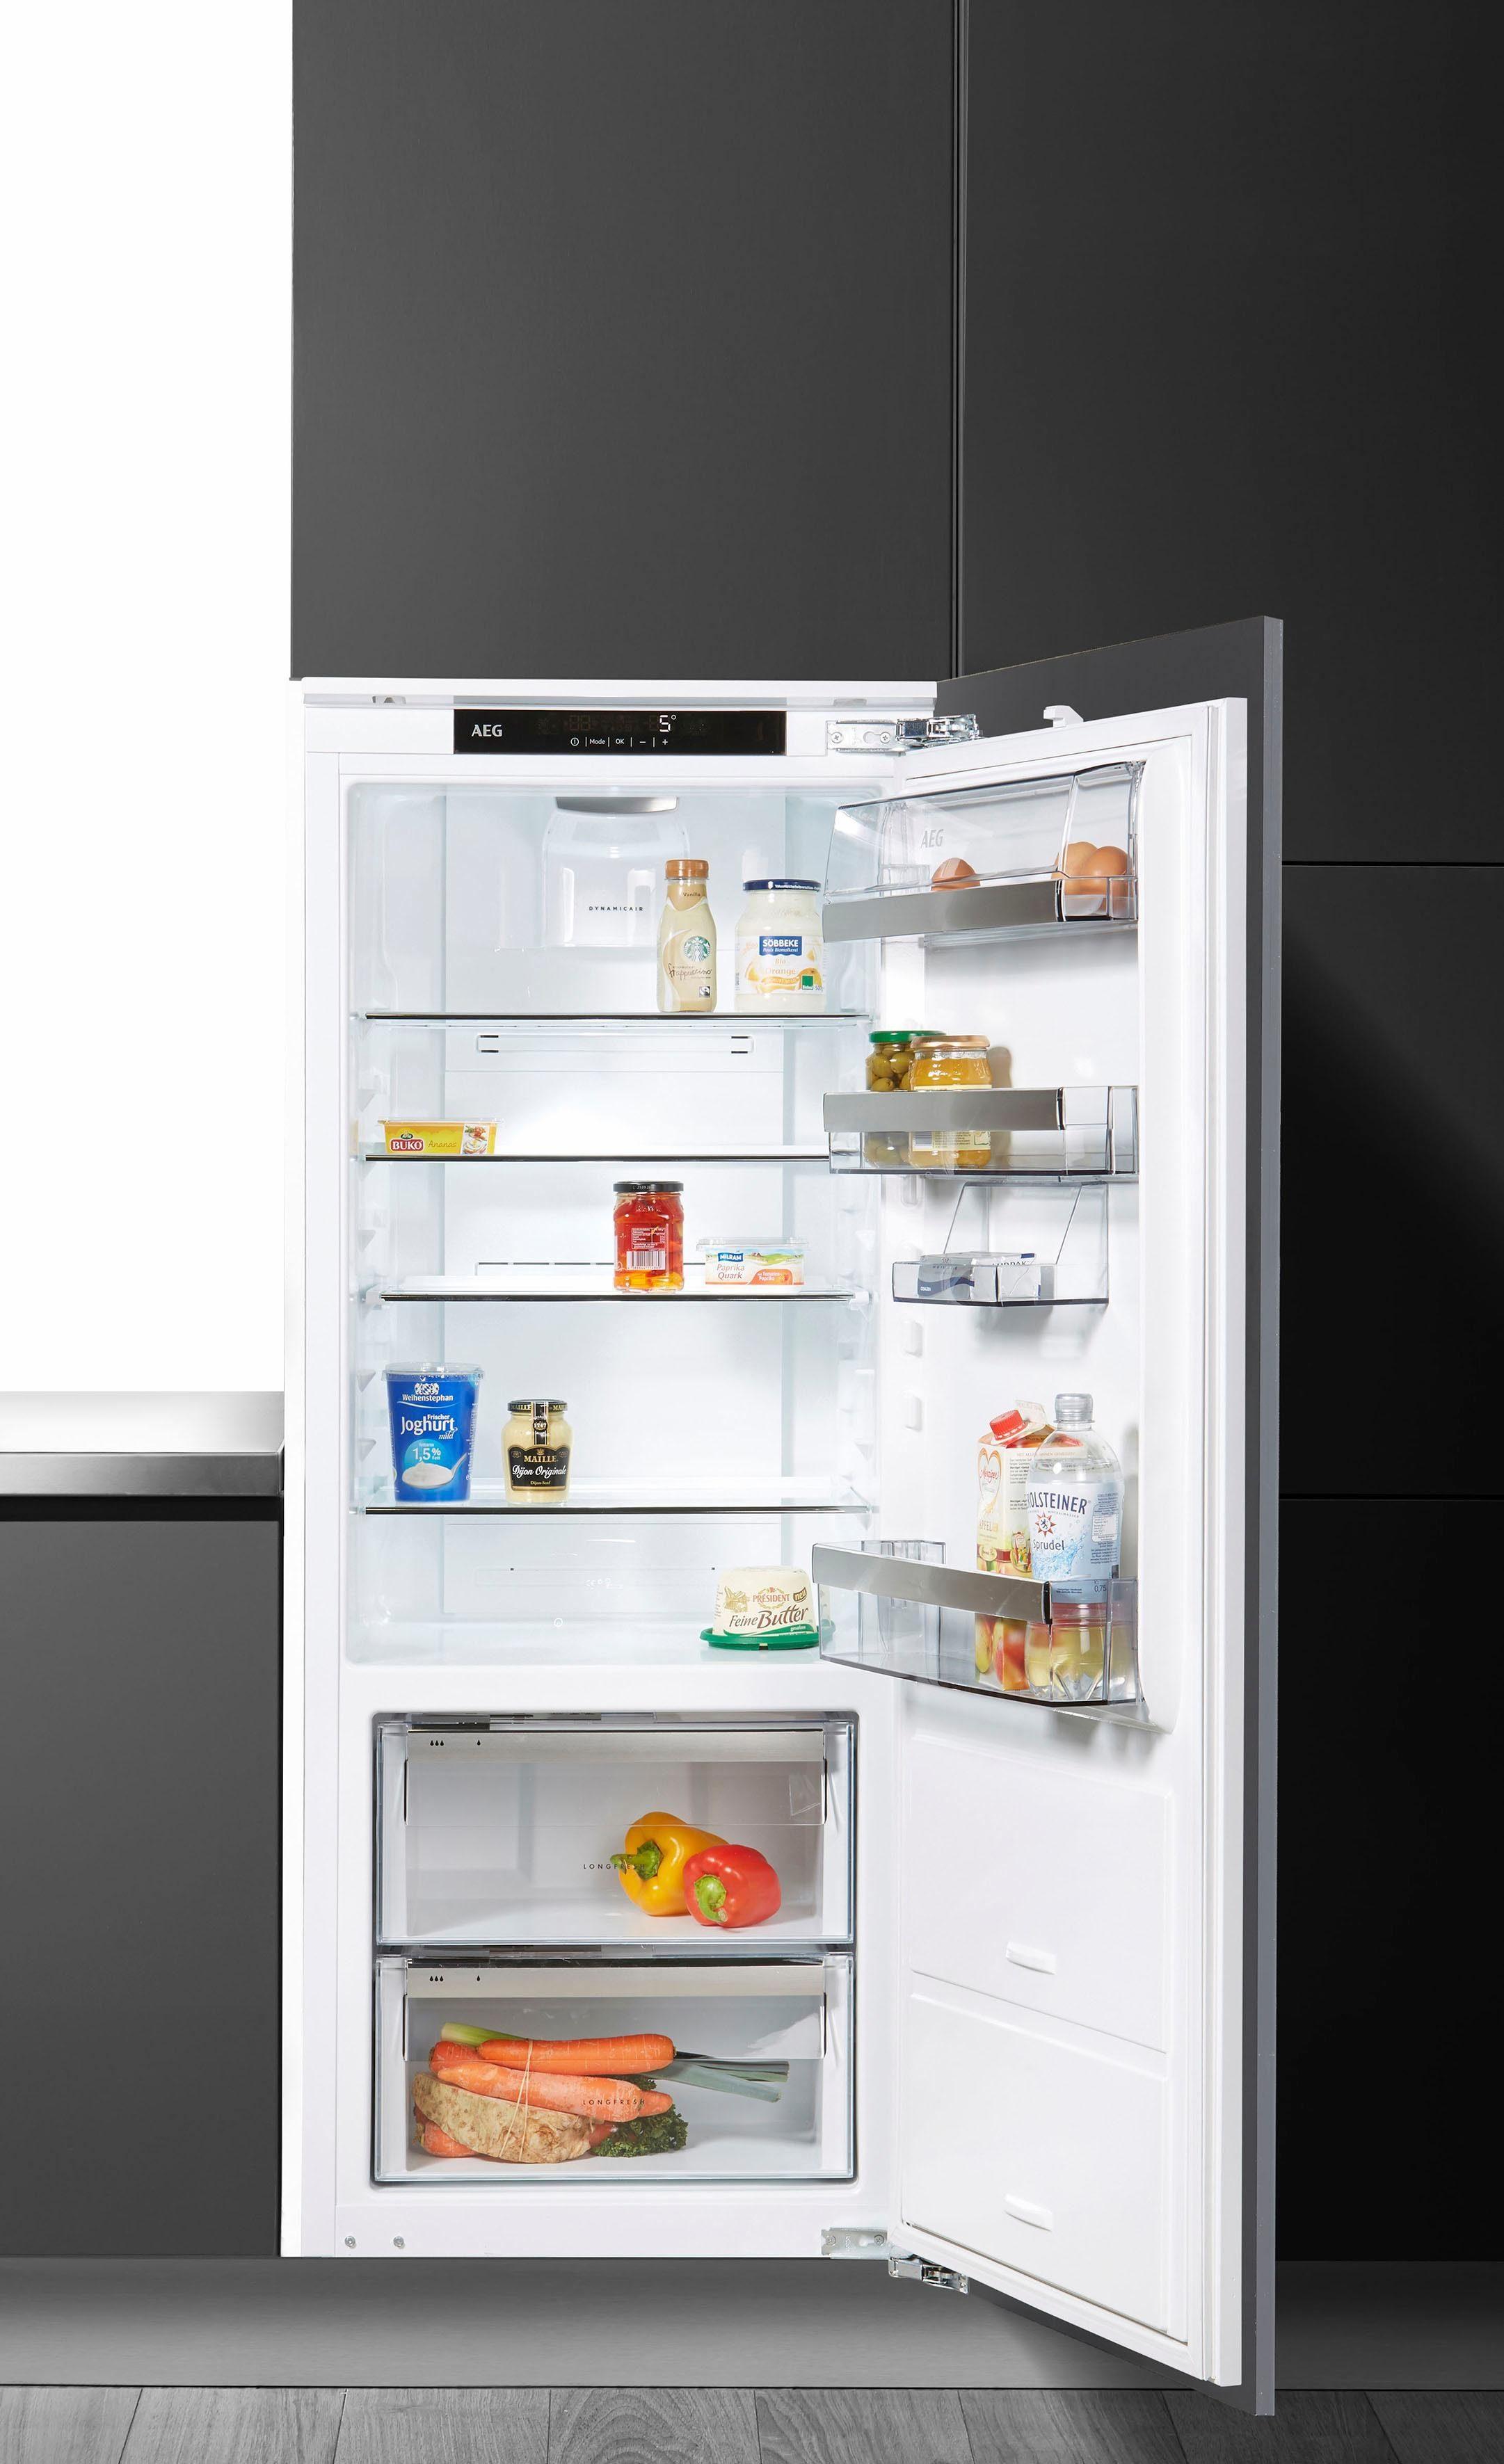 AEG integrierbarer Einbau-Kühlschrank SANTO SKE81436ZC, A+++, 140 cm hoch